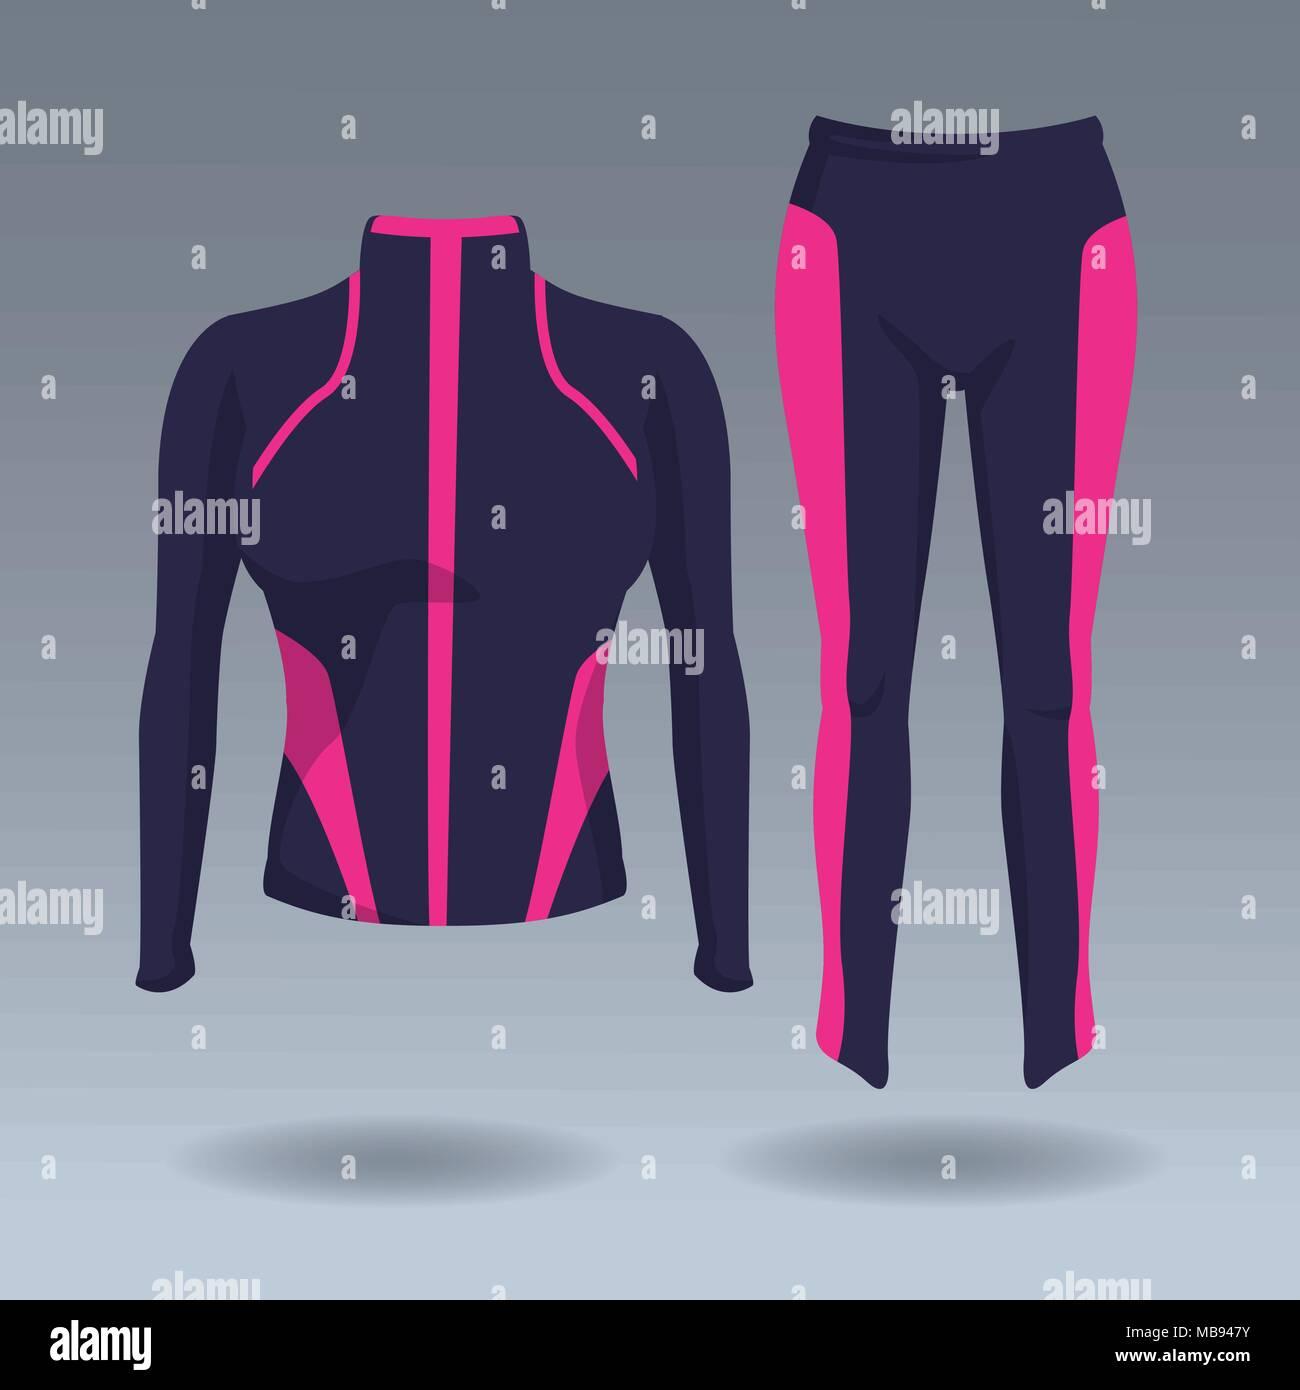 b2e617761 Fitness women jacket and pants - Stock Vector